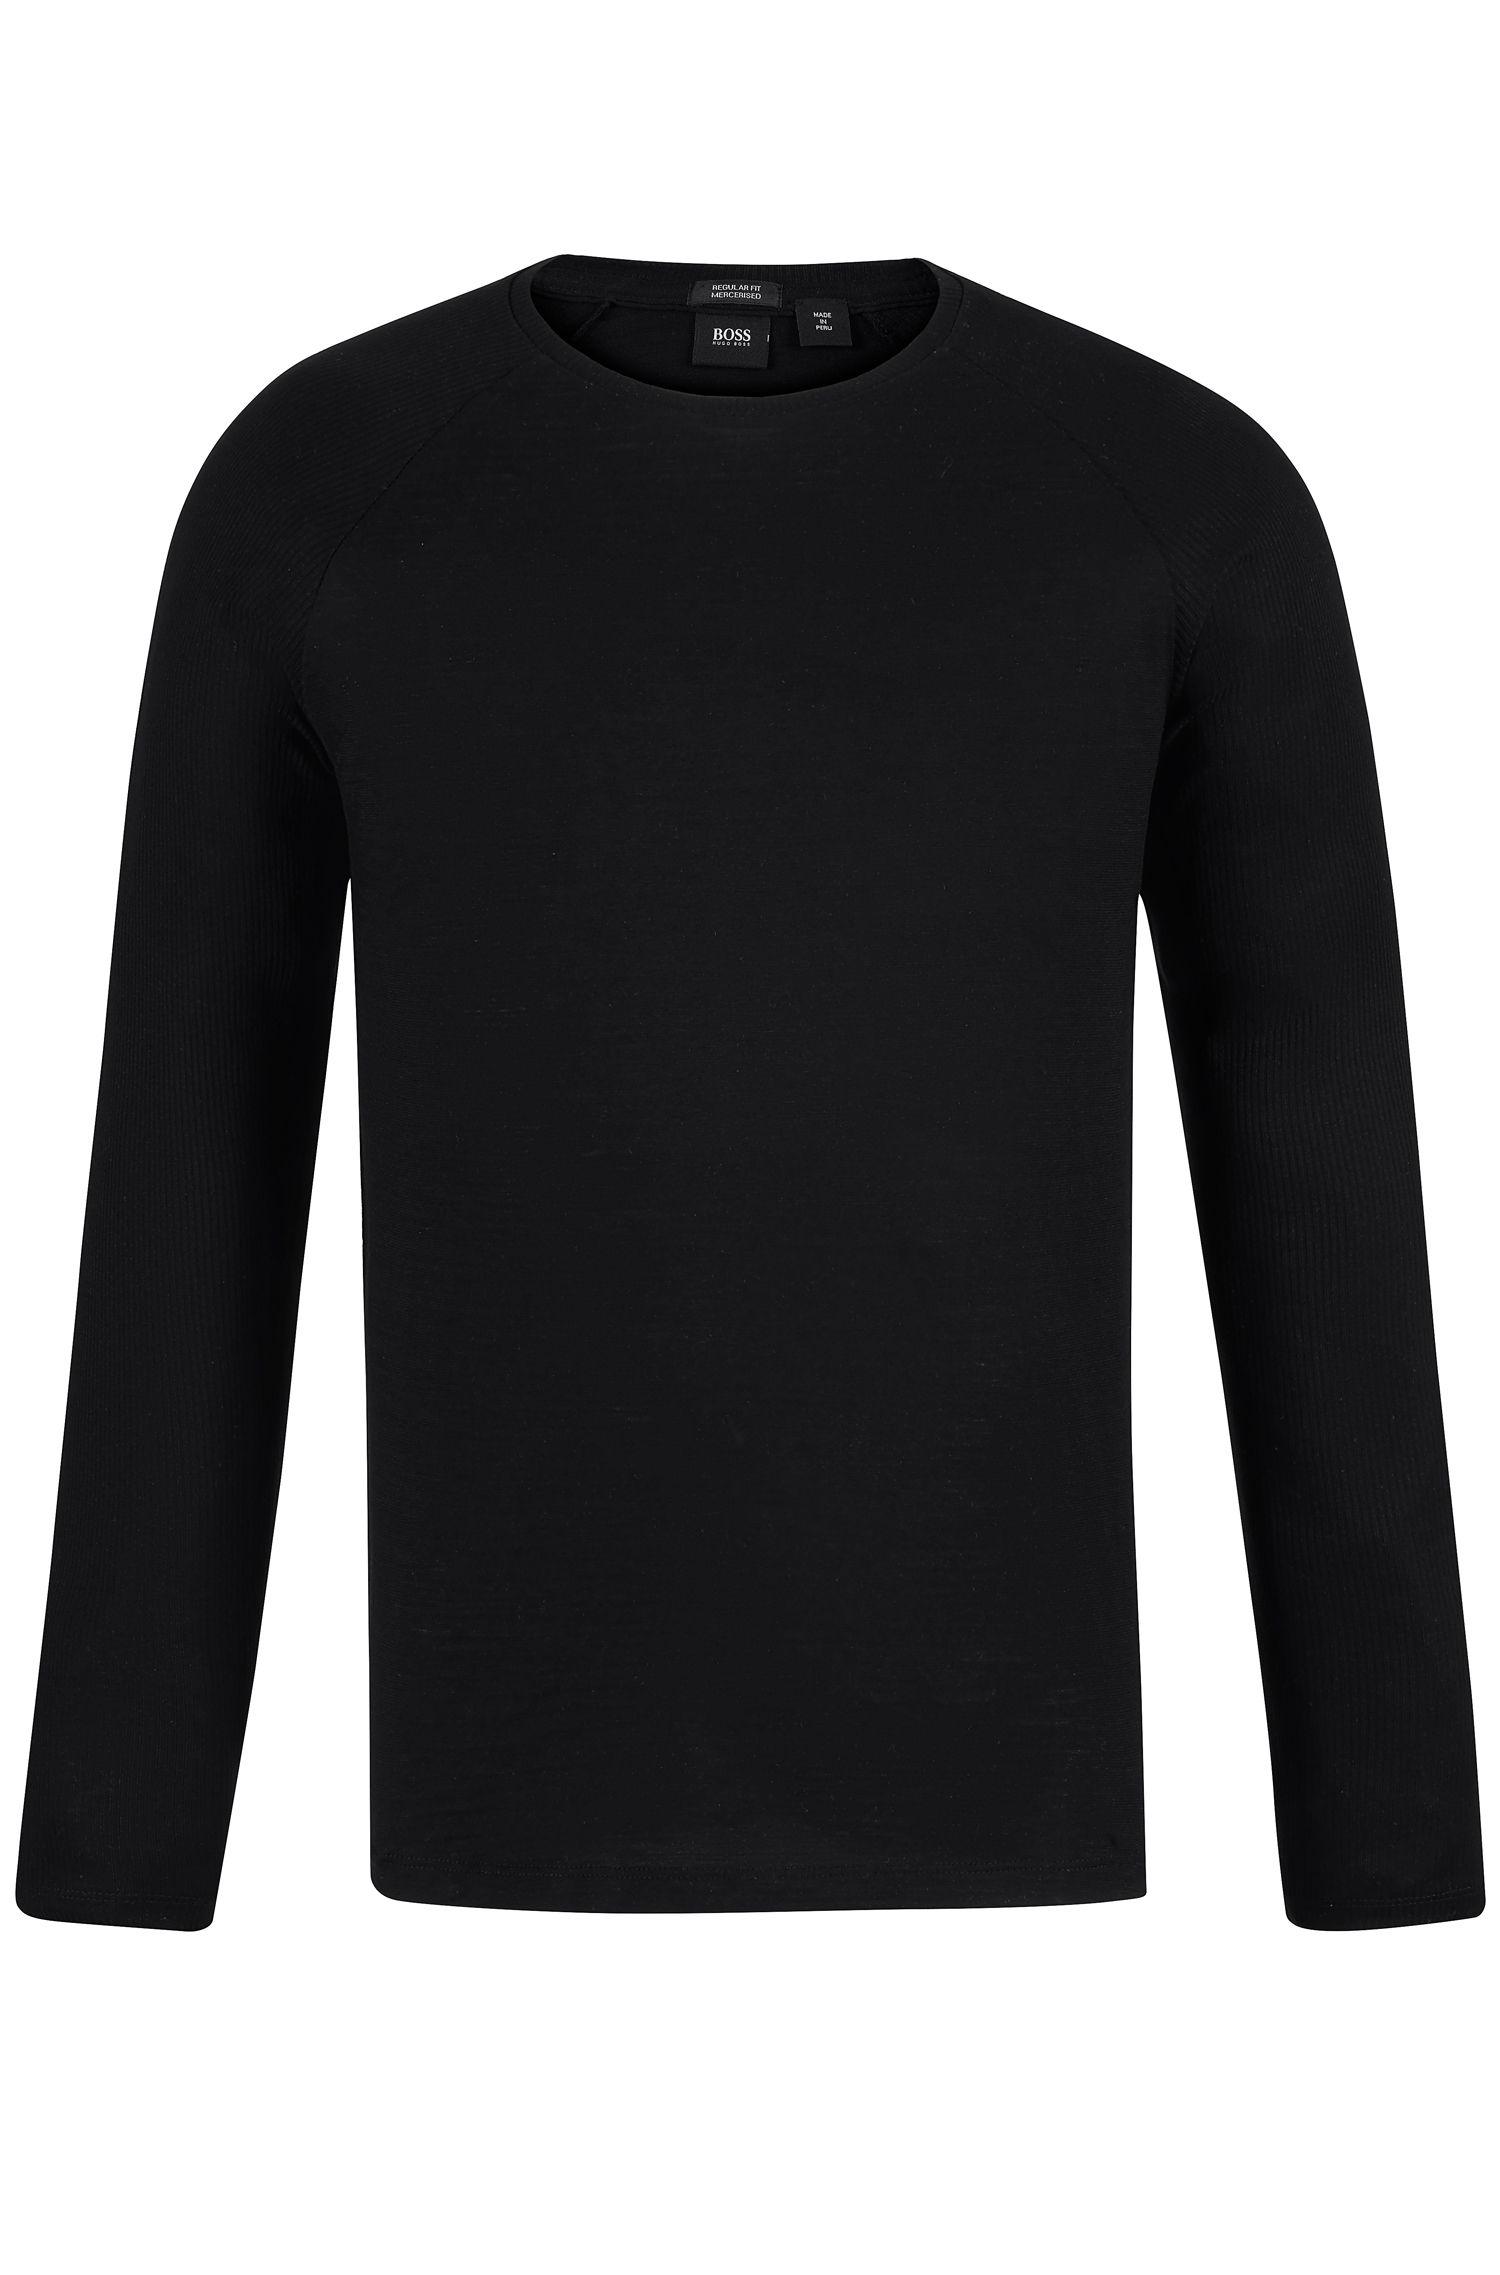 'Terell'   Cotton Long-Sleeved T-Shirt